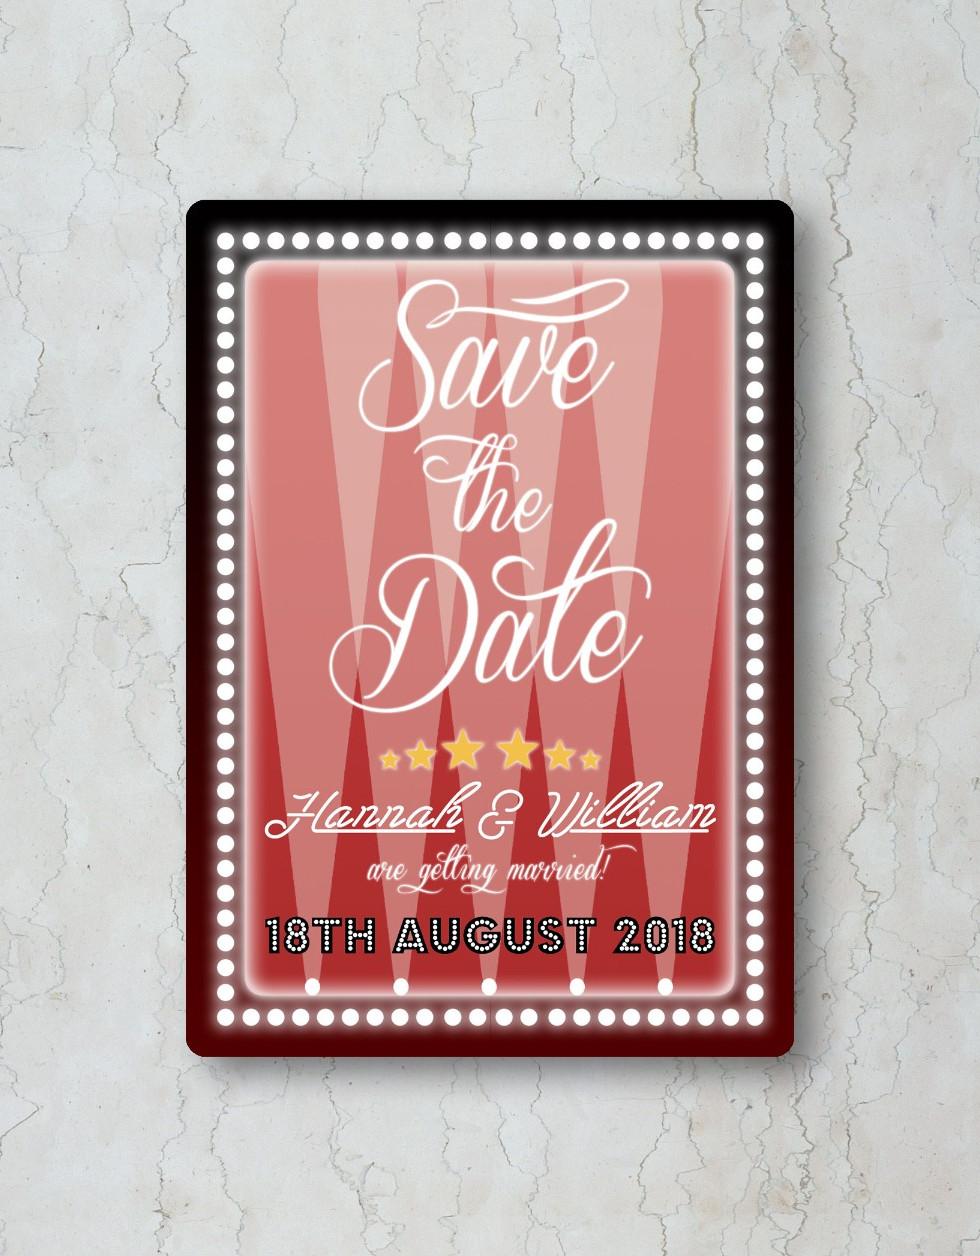 Hollywood Save the Date Wedding Invitati